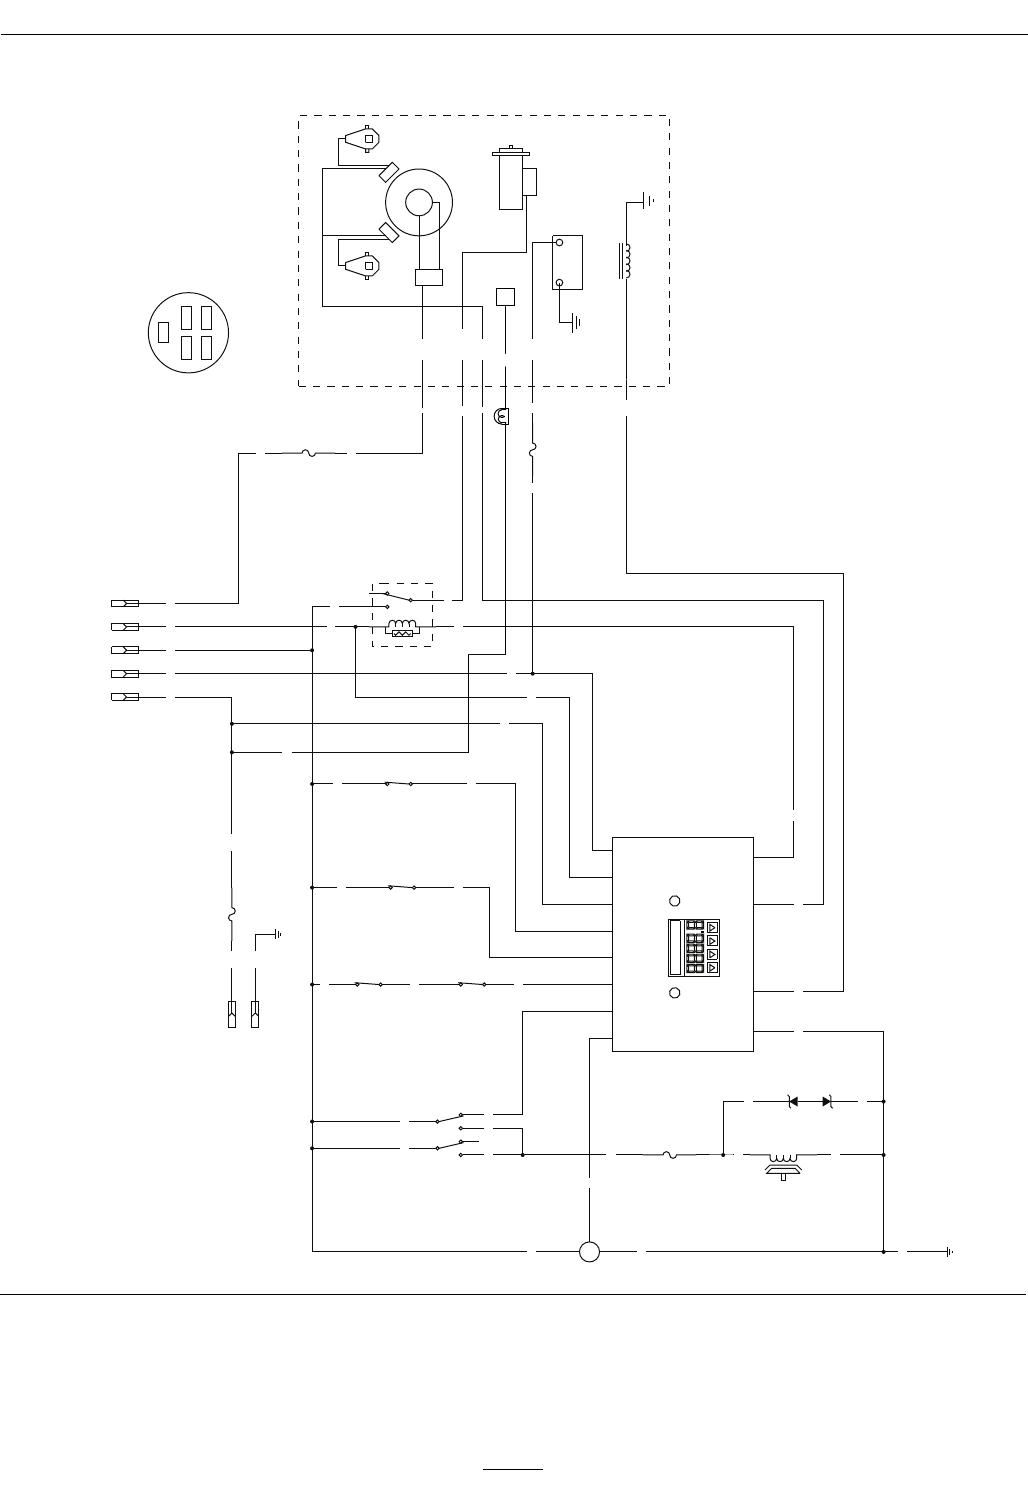 Exmark Lazer Z S Series 0 Users Manual Lb75 Wiring Diagram Schematics